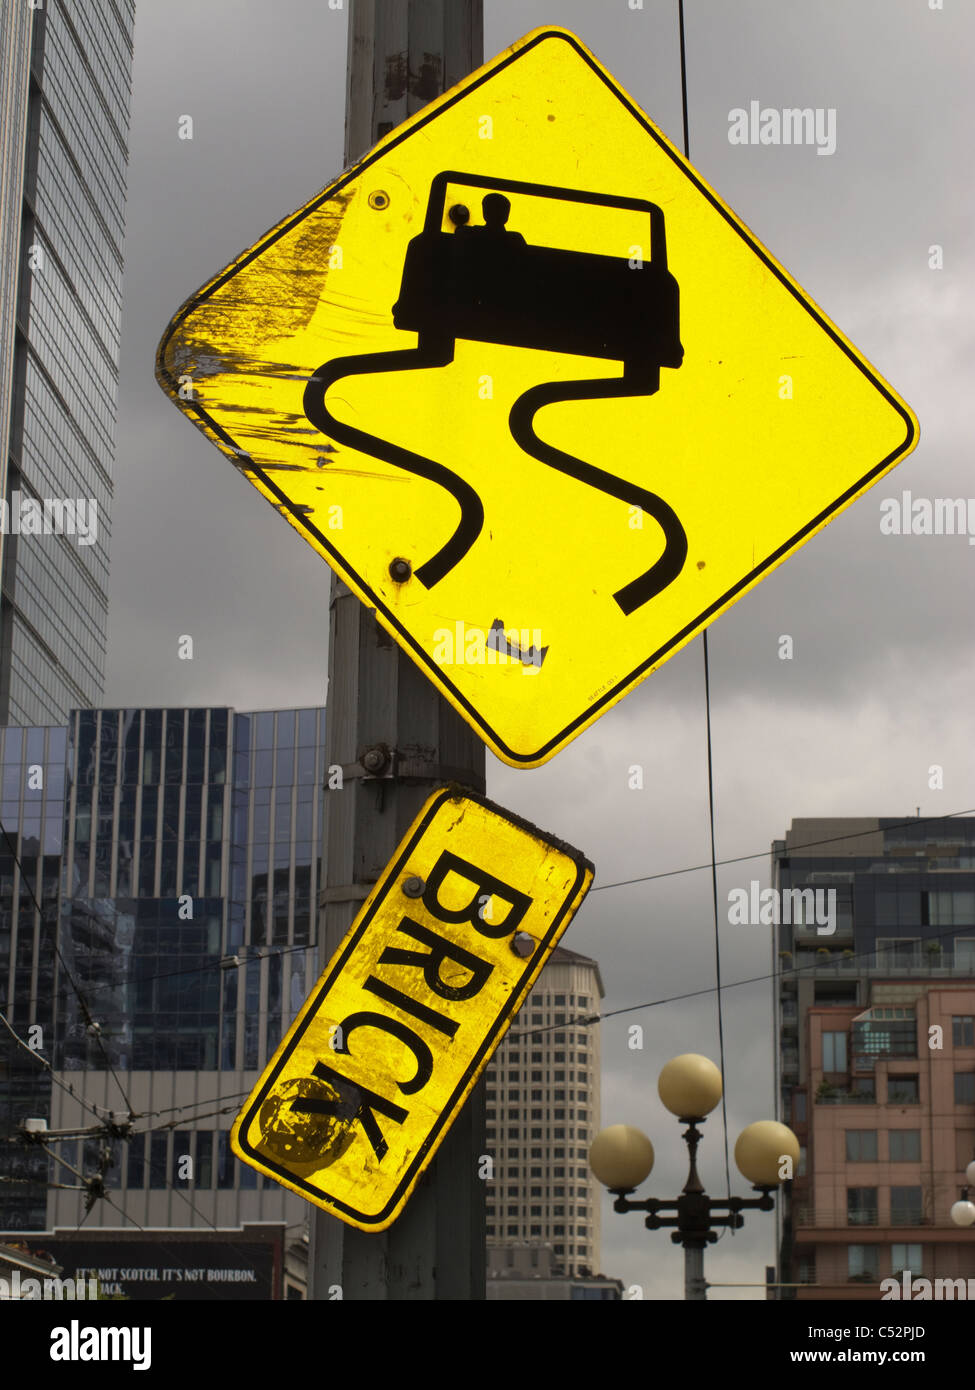 Strange Road Sign in Seattle, Washington, USA Stock Photo